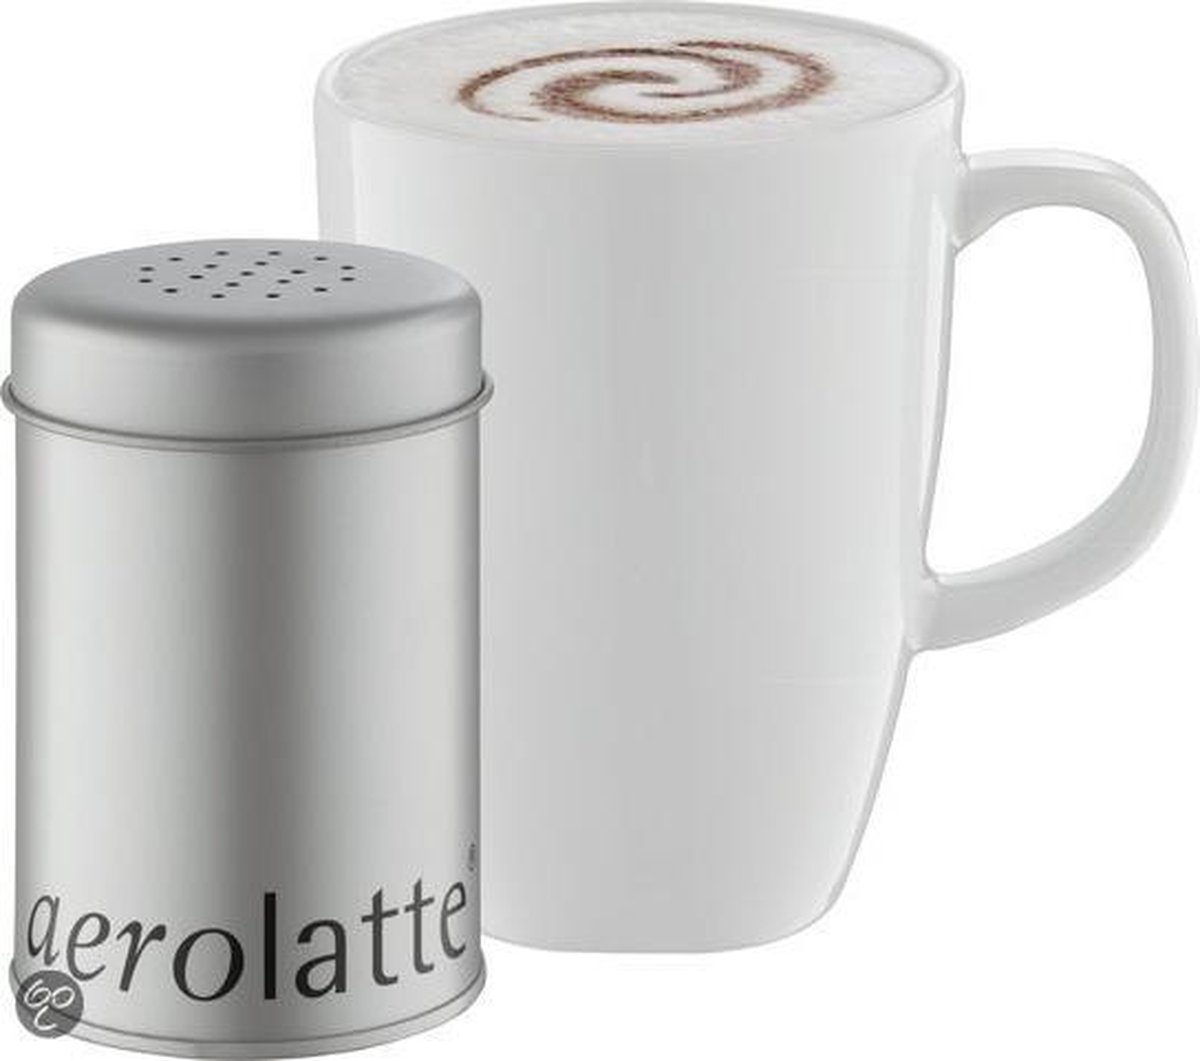 Cacaostrooier Aerolatte